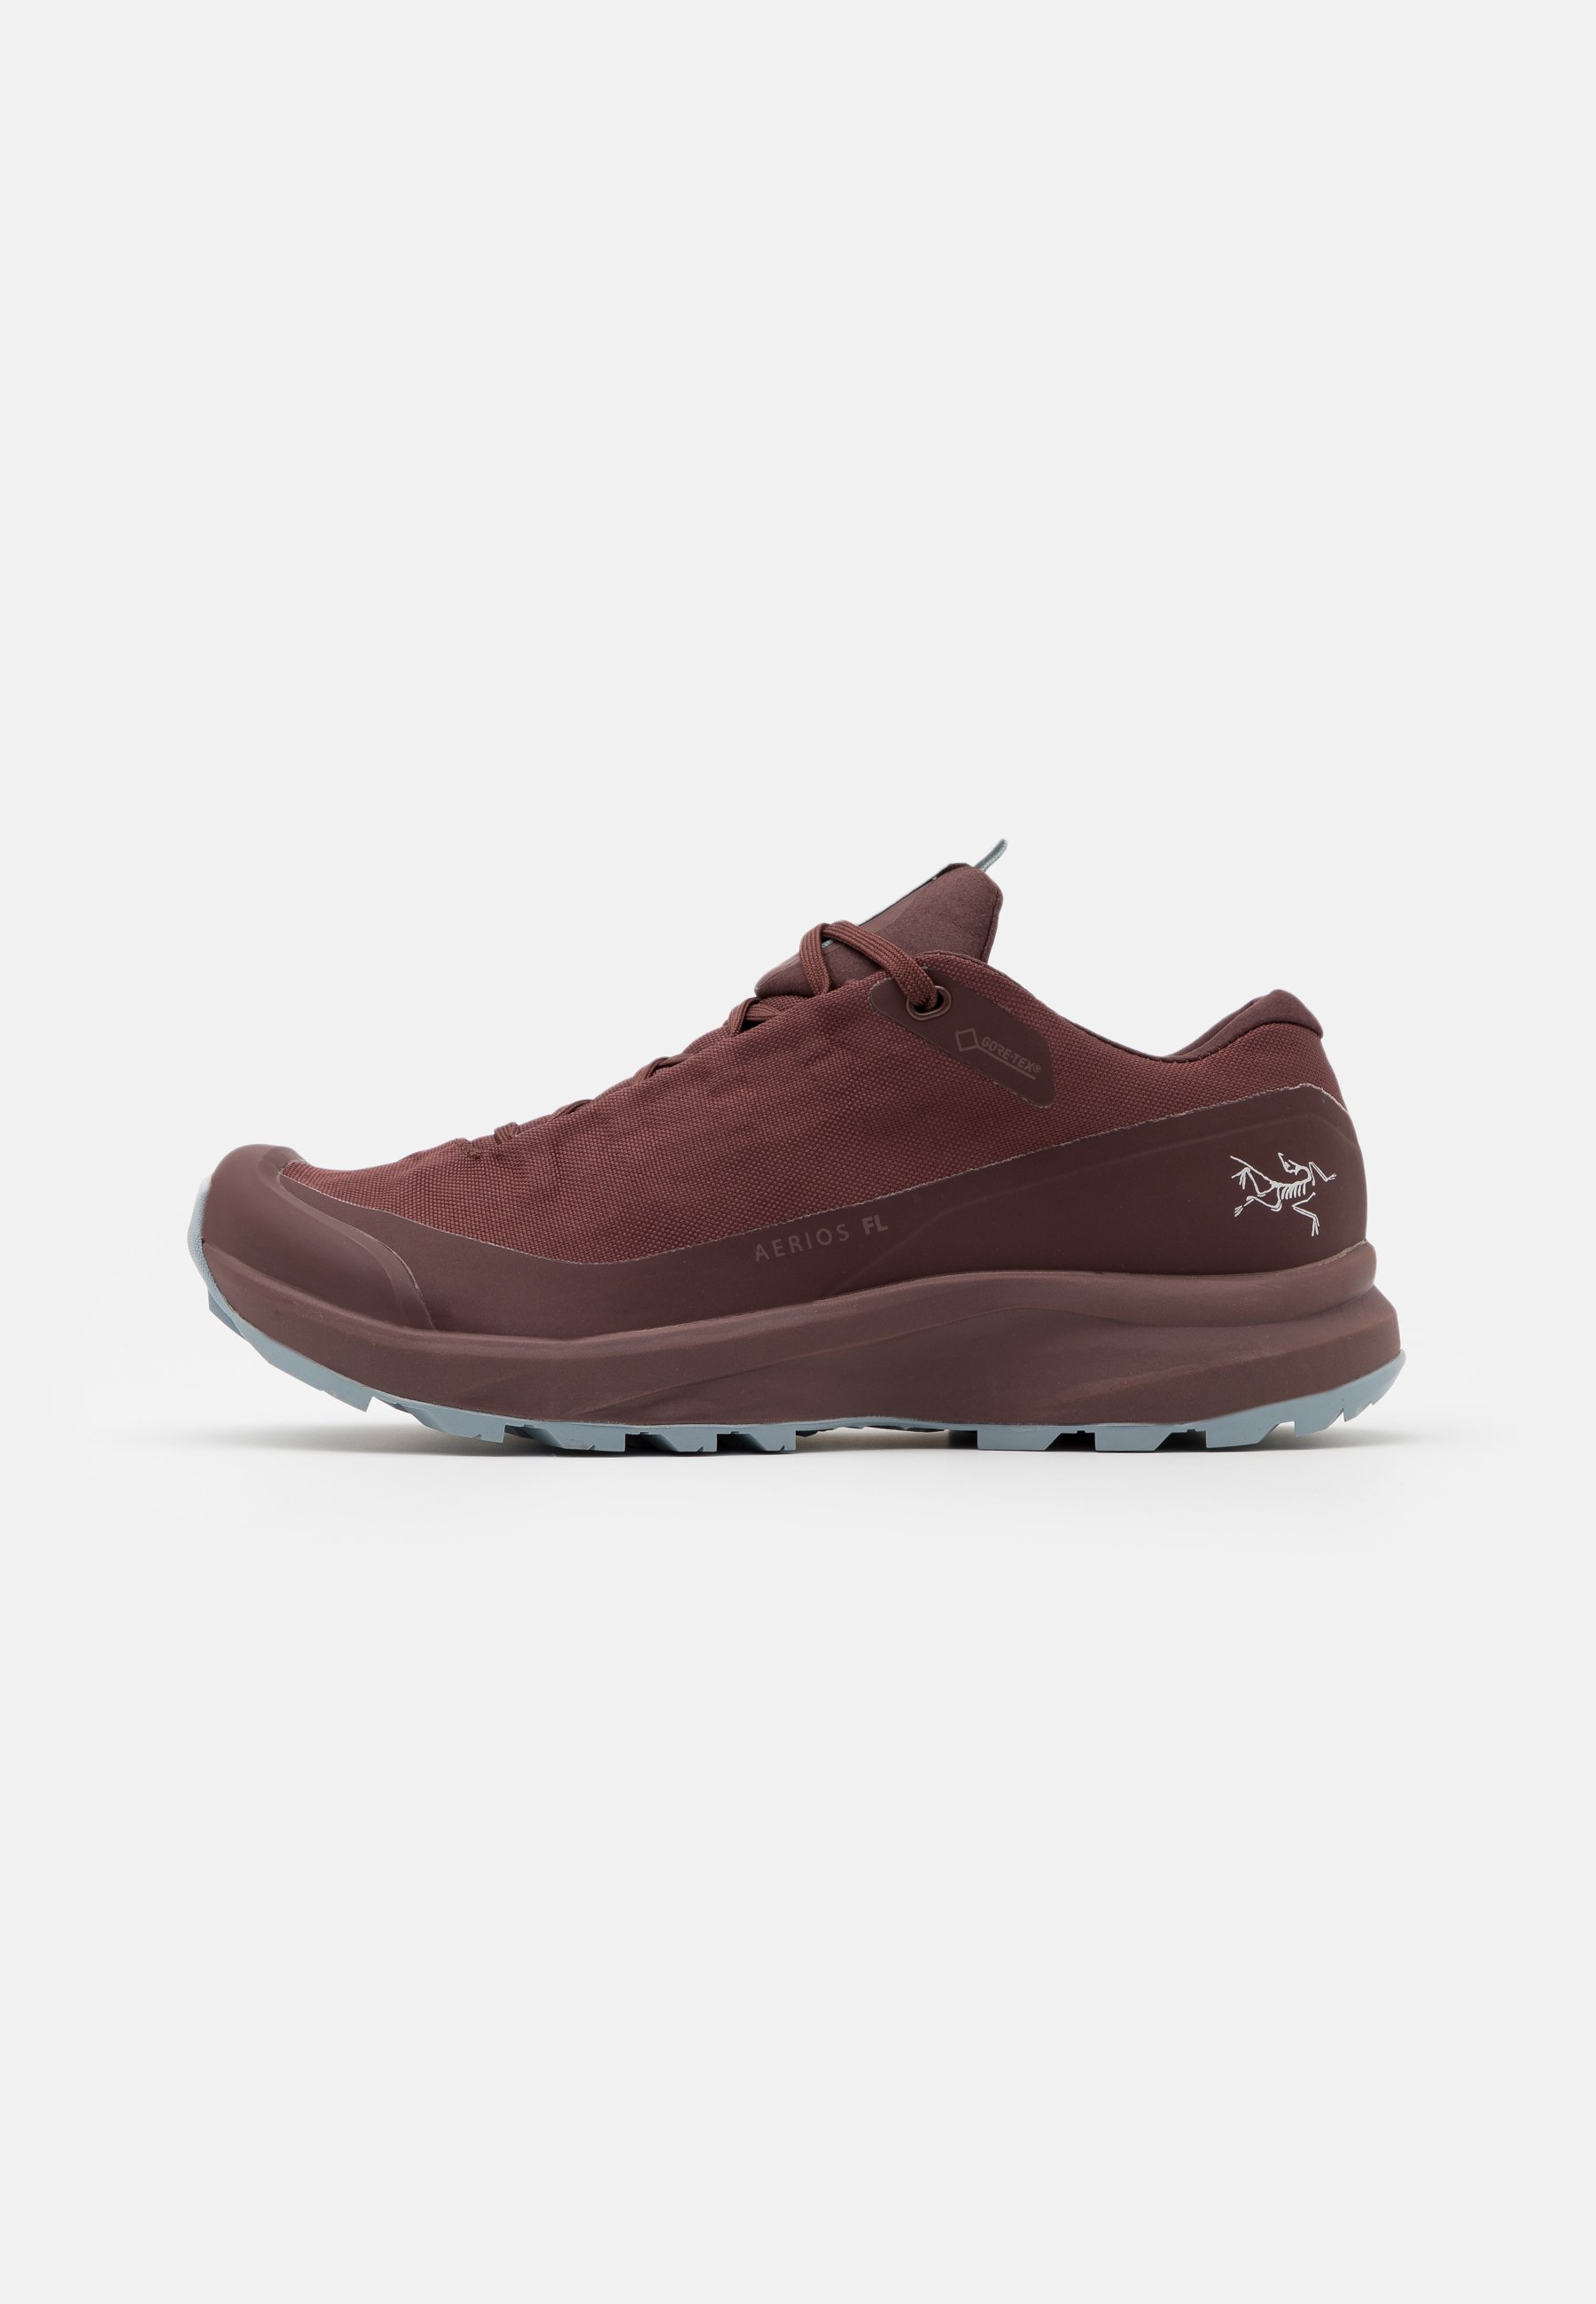 Women AERIOS FL GTX W - Hiking shoes